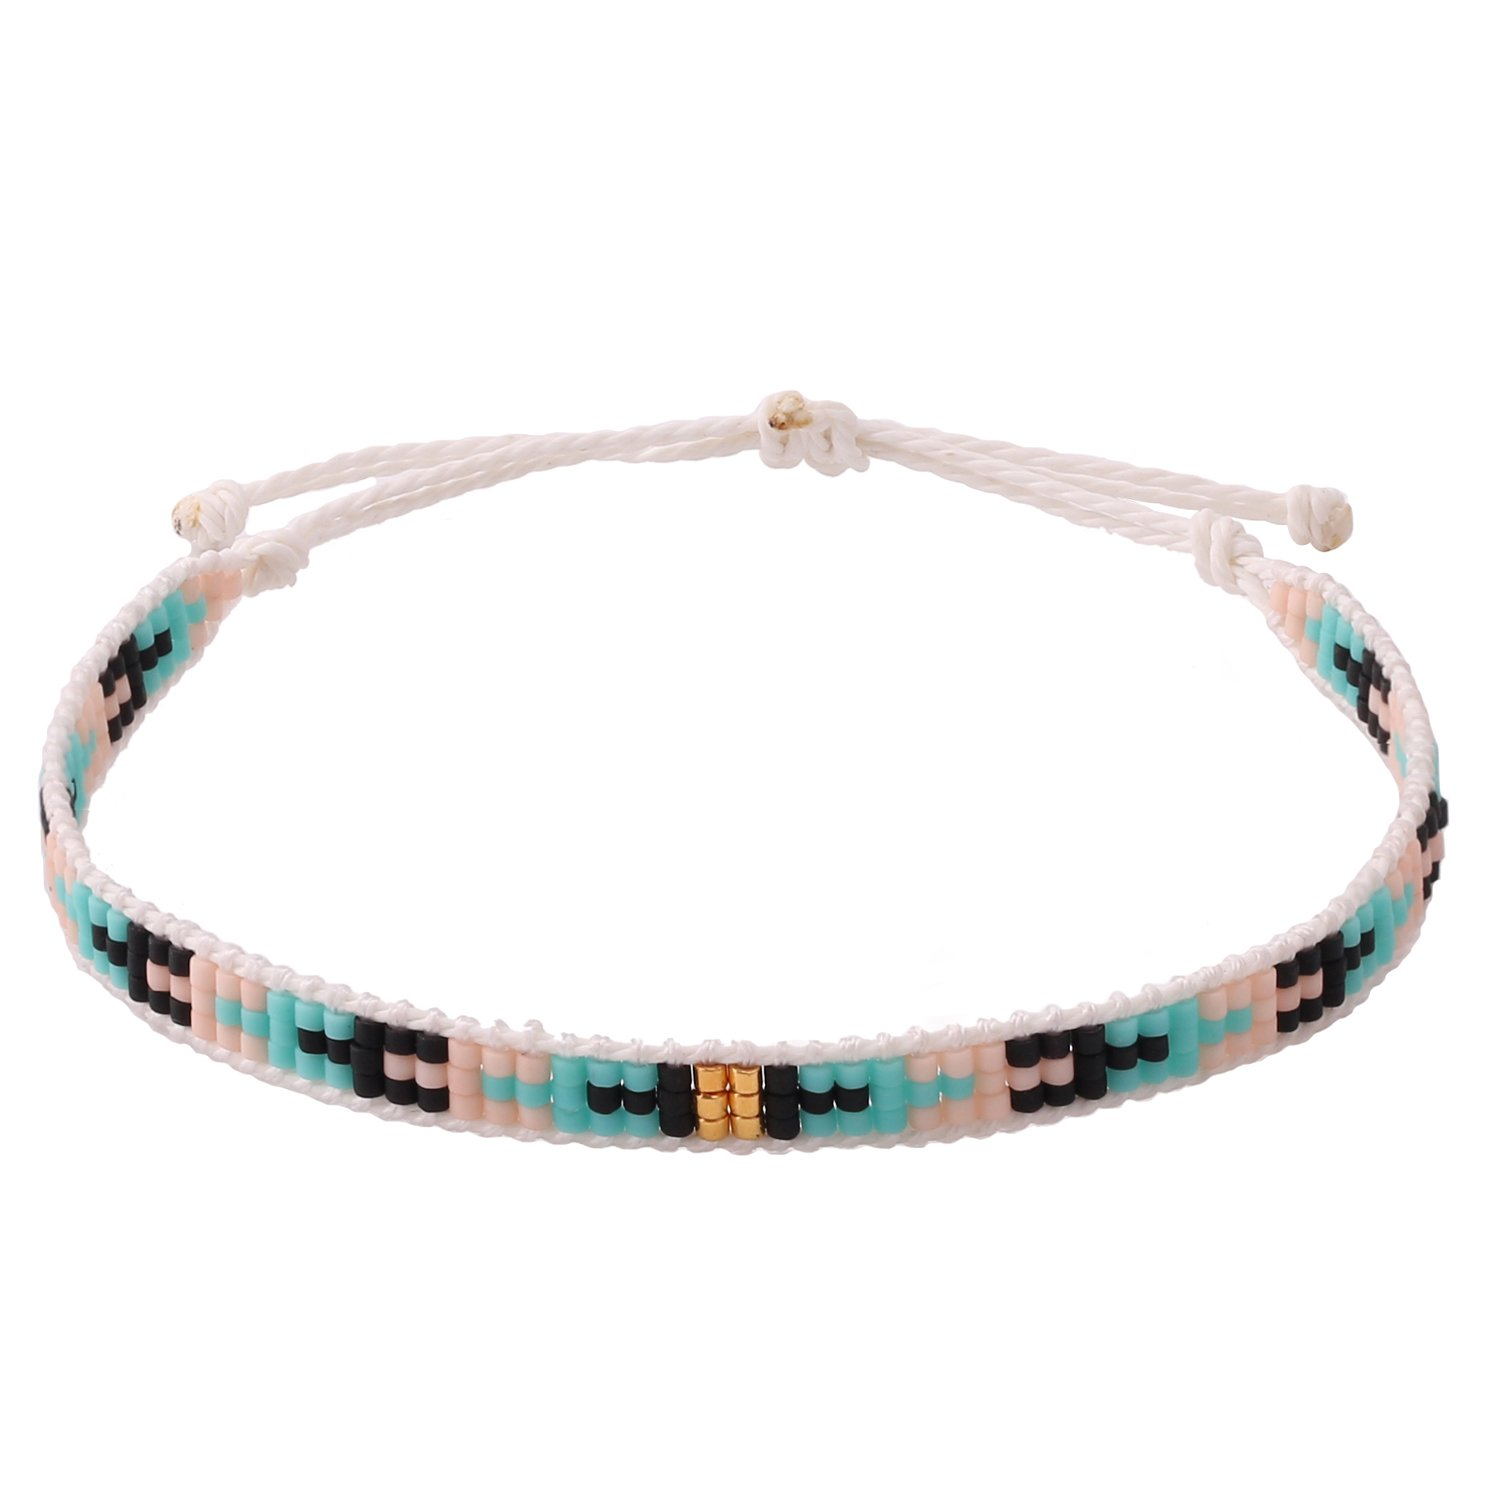 KELITCH Pearl Sead Beaded Wax rope Charm Wrap Bracelets Handmade Friendship New Women Jewelry (Green 66Q)